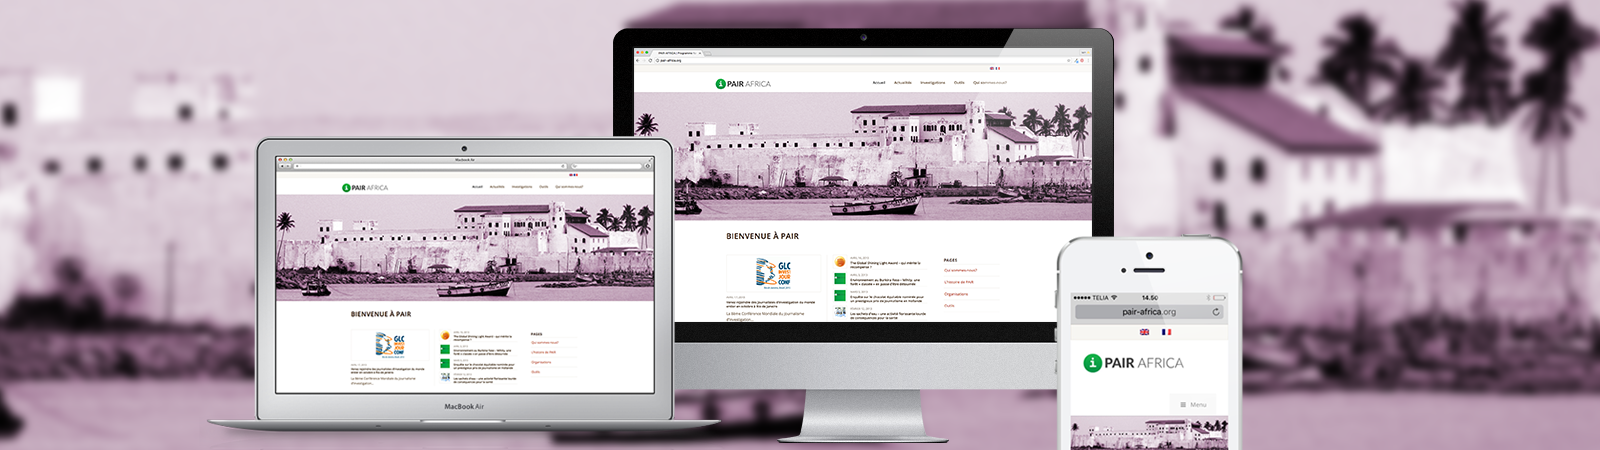 webdesign-pair-africa-website